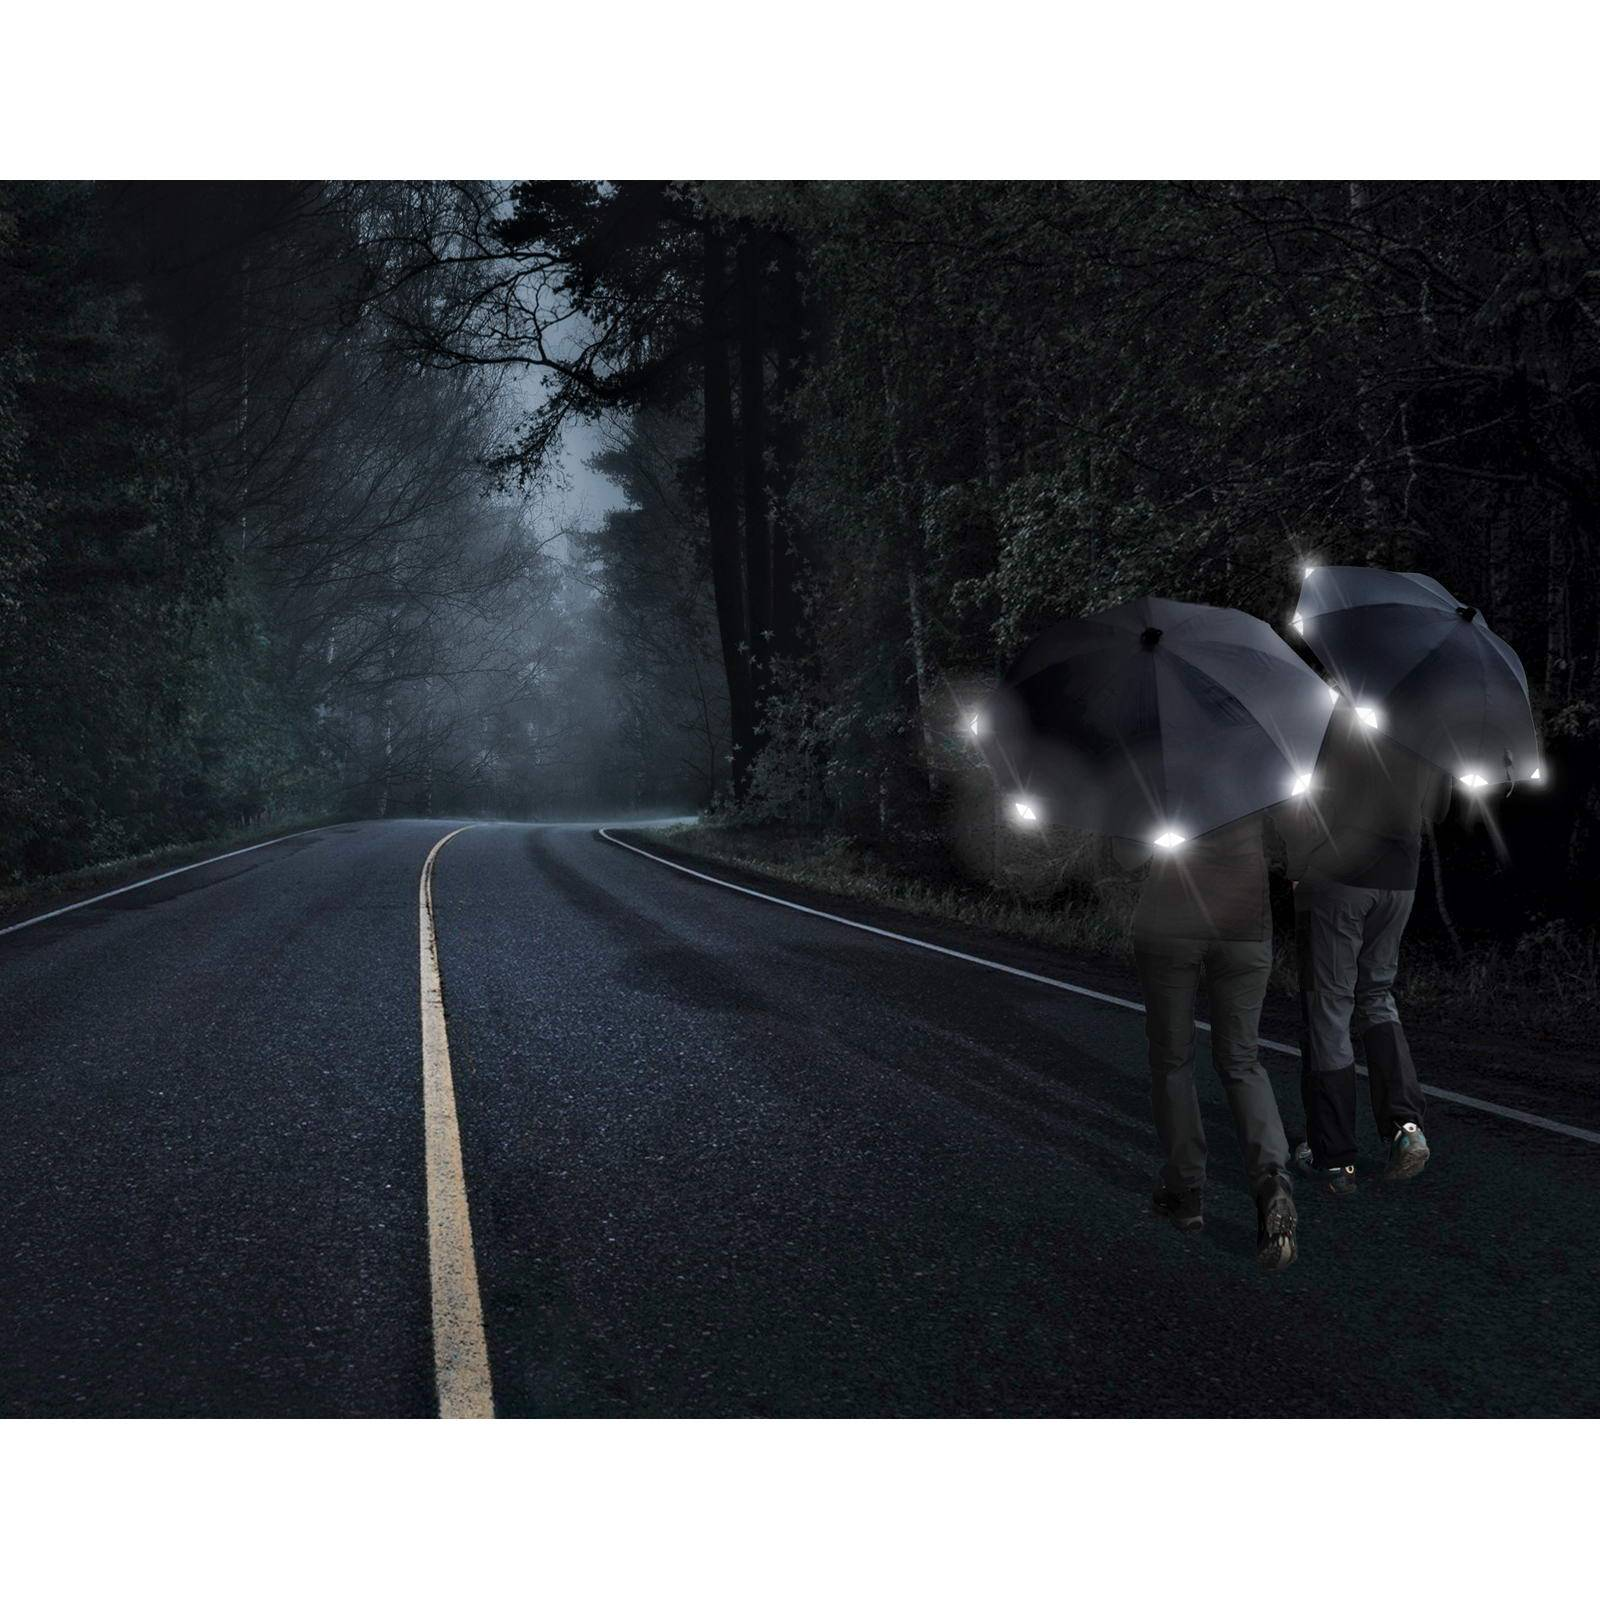 EuroSchirm light trek automatic - Regenschirm reflective - Bild 5